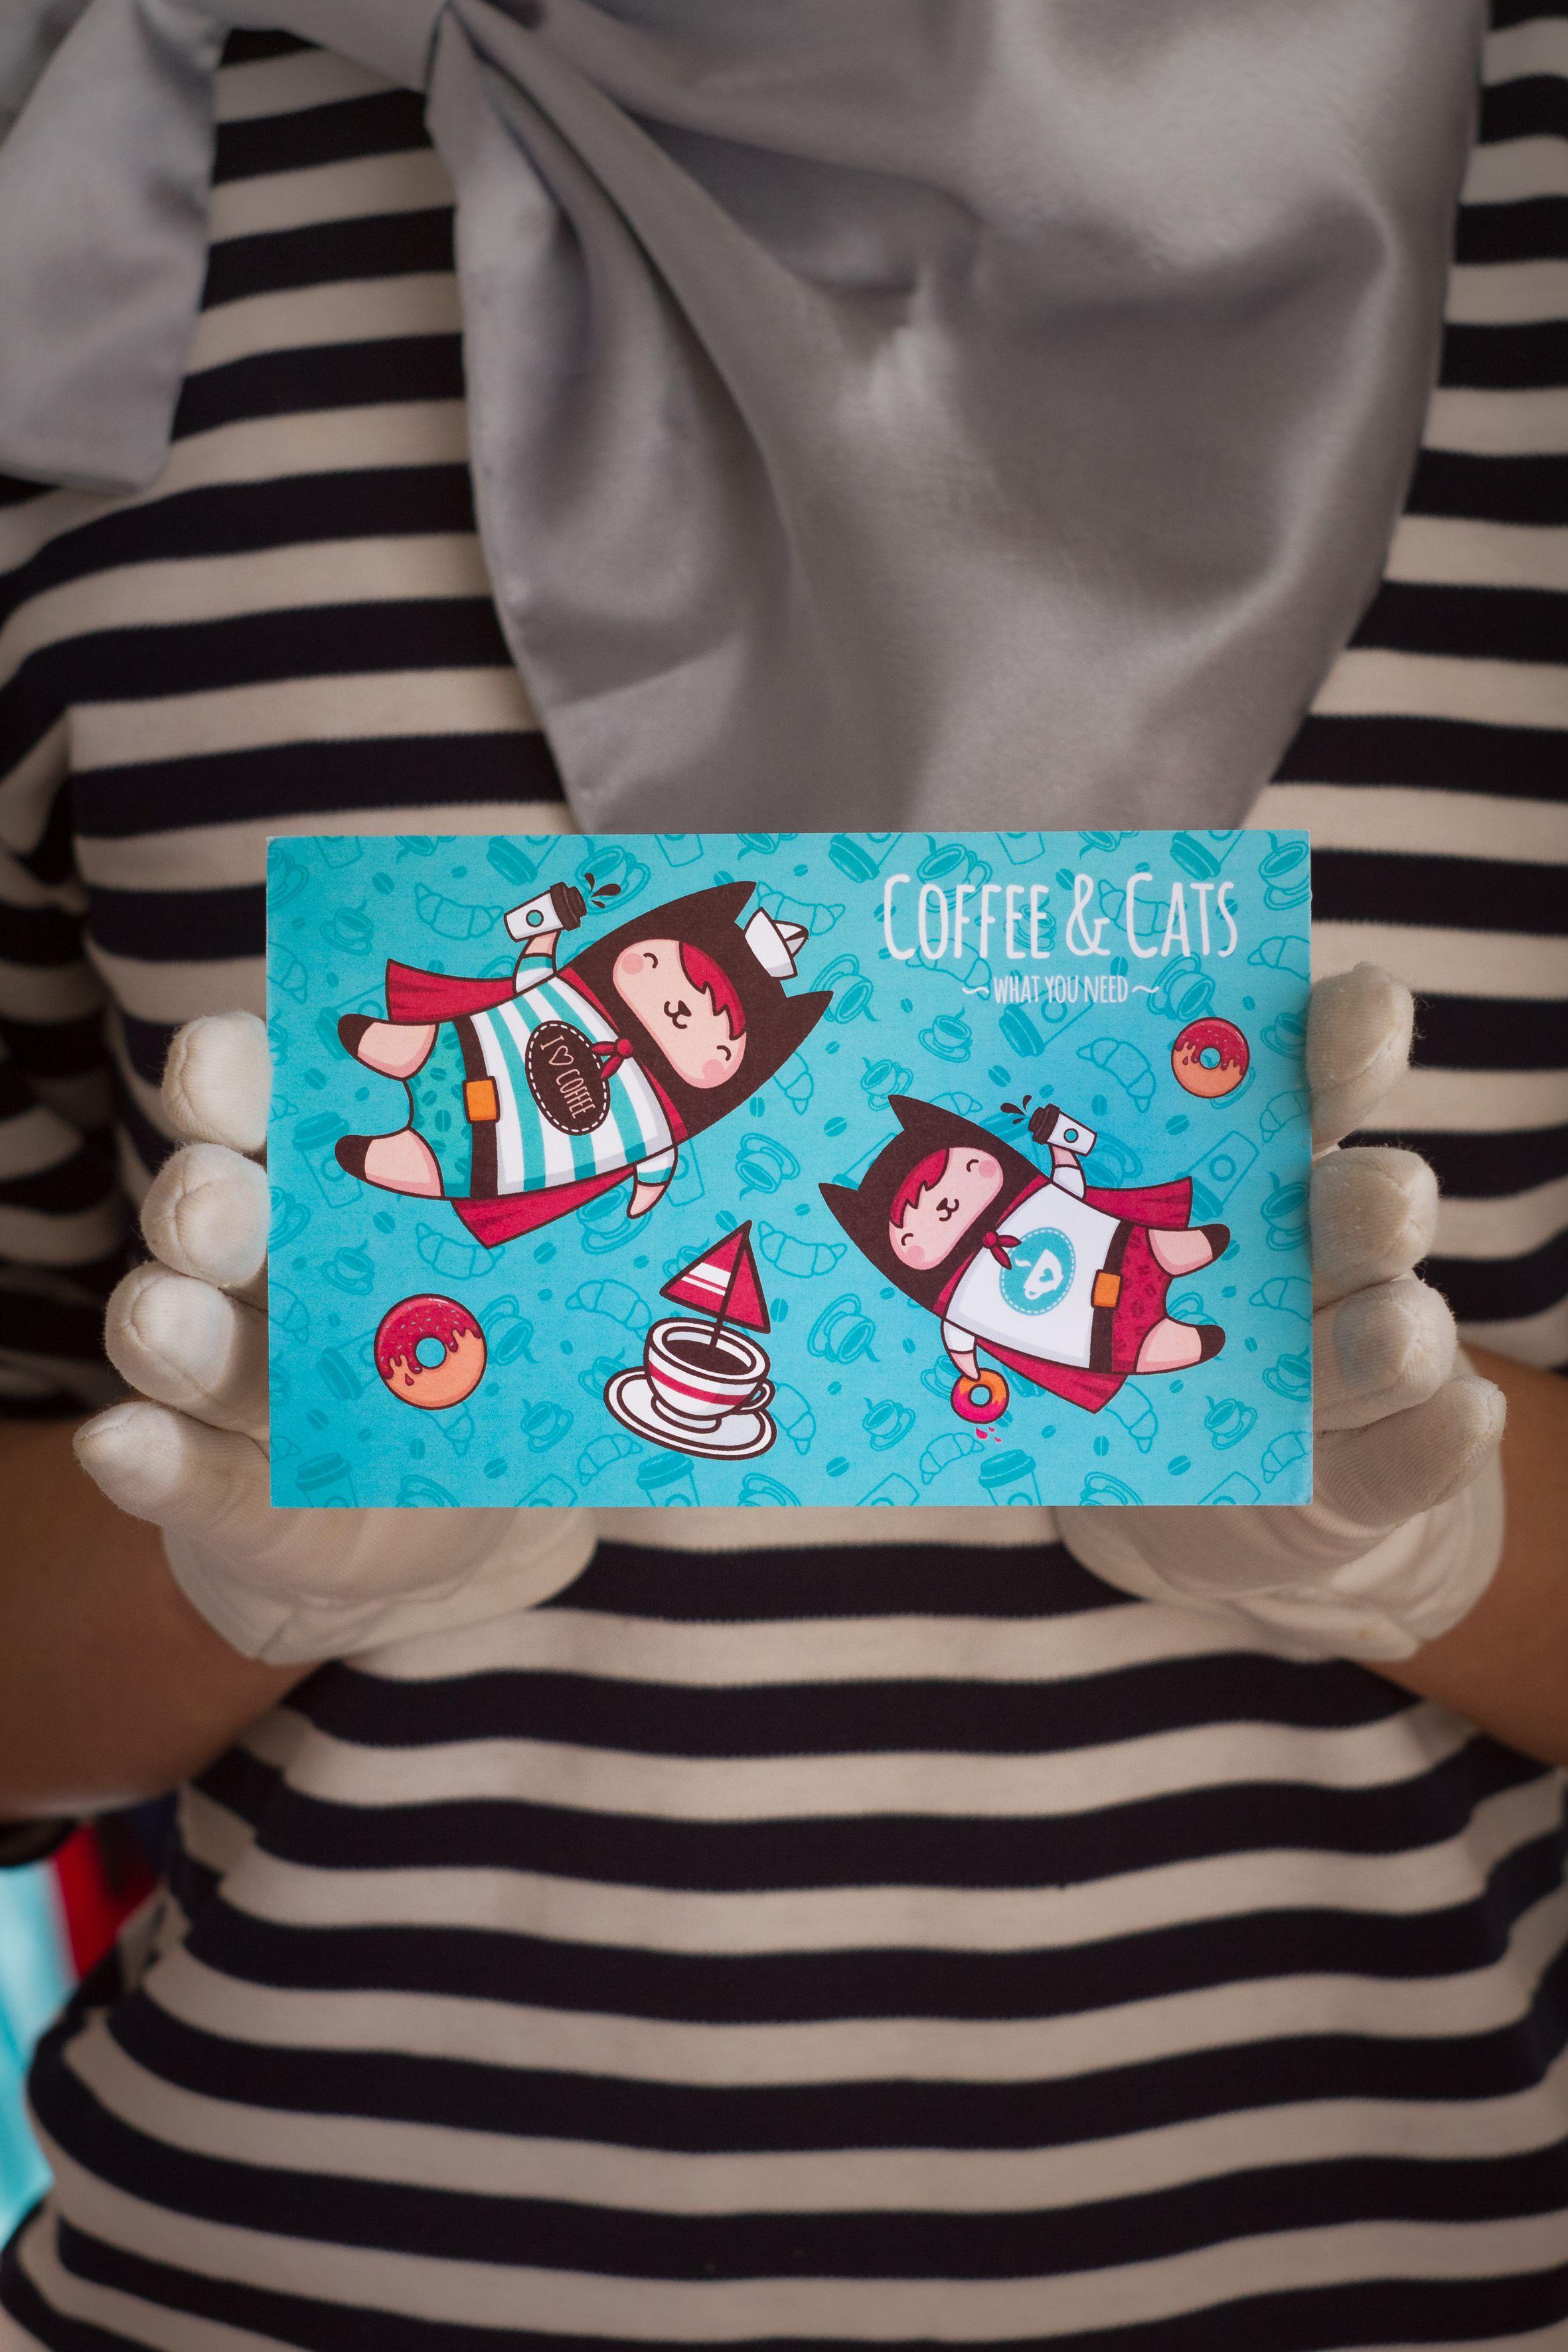 coffee знаквнимания gift cats card сюрприз surprise remembrance коты открытка кофе кошки подарок